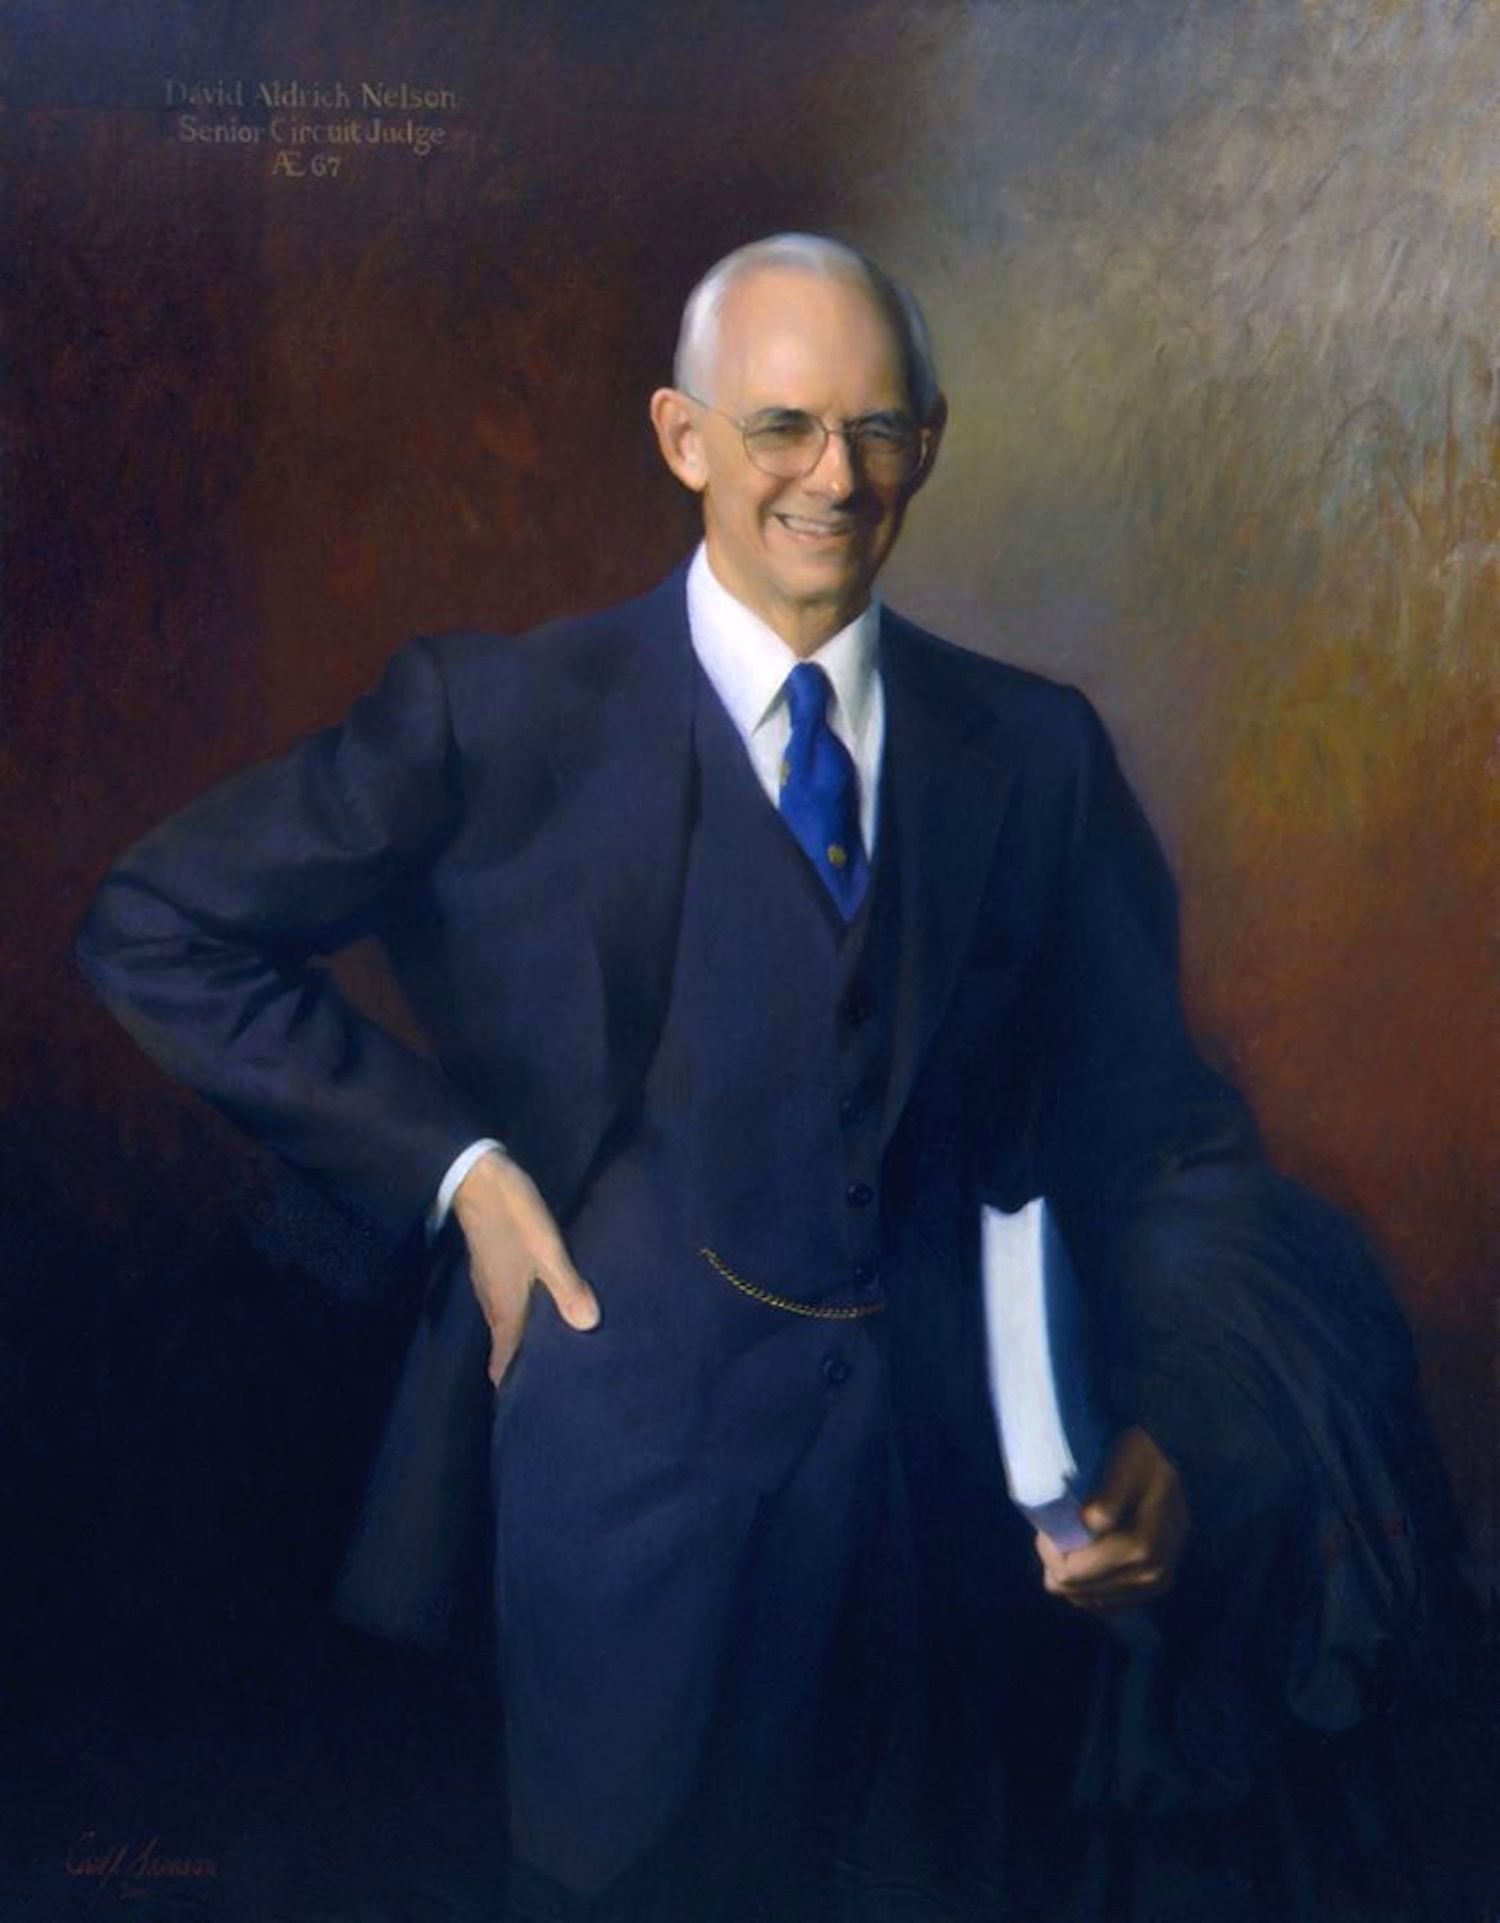 Federal Judge David A. Nelson